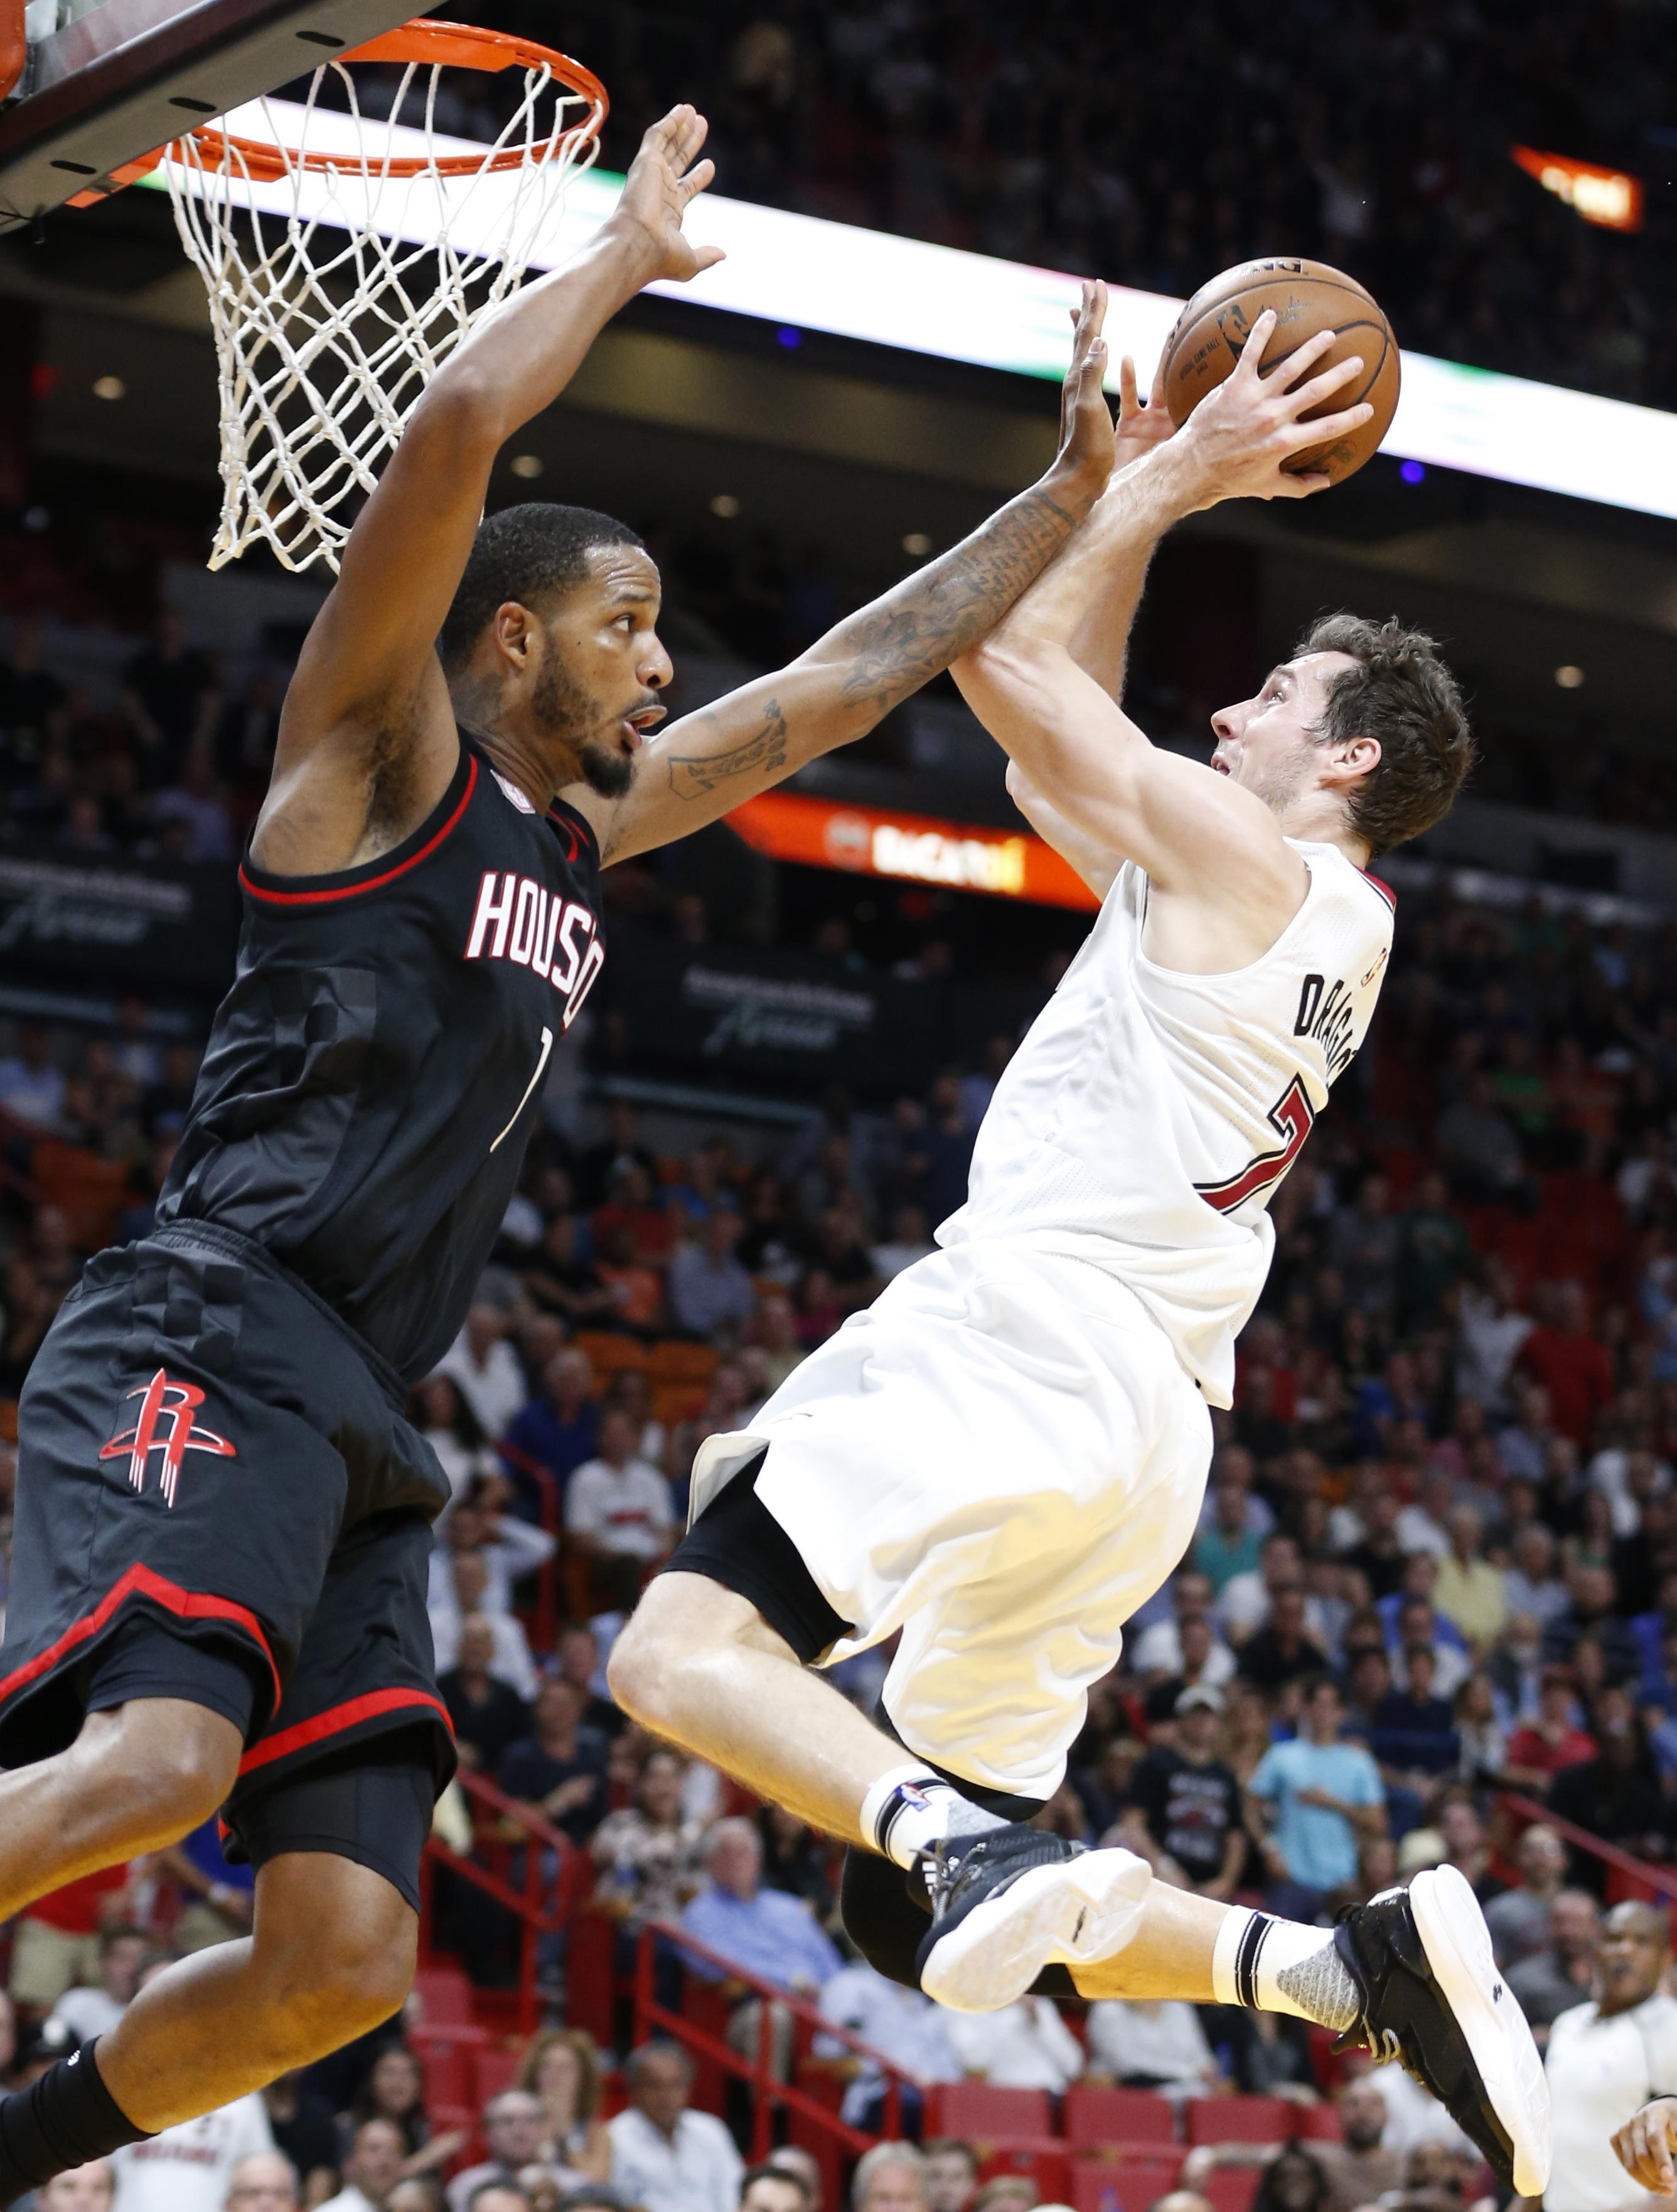 ca5737a39c80 NBA roundup  Goran Dragic leads Heat to upset over Rockets